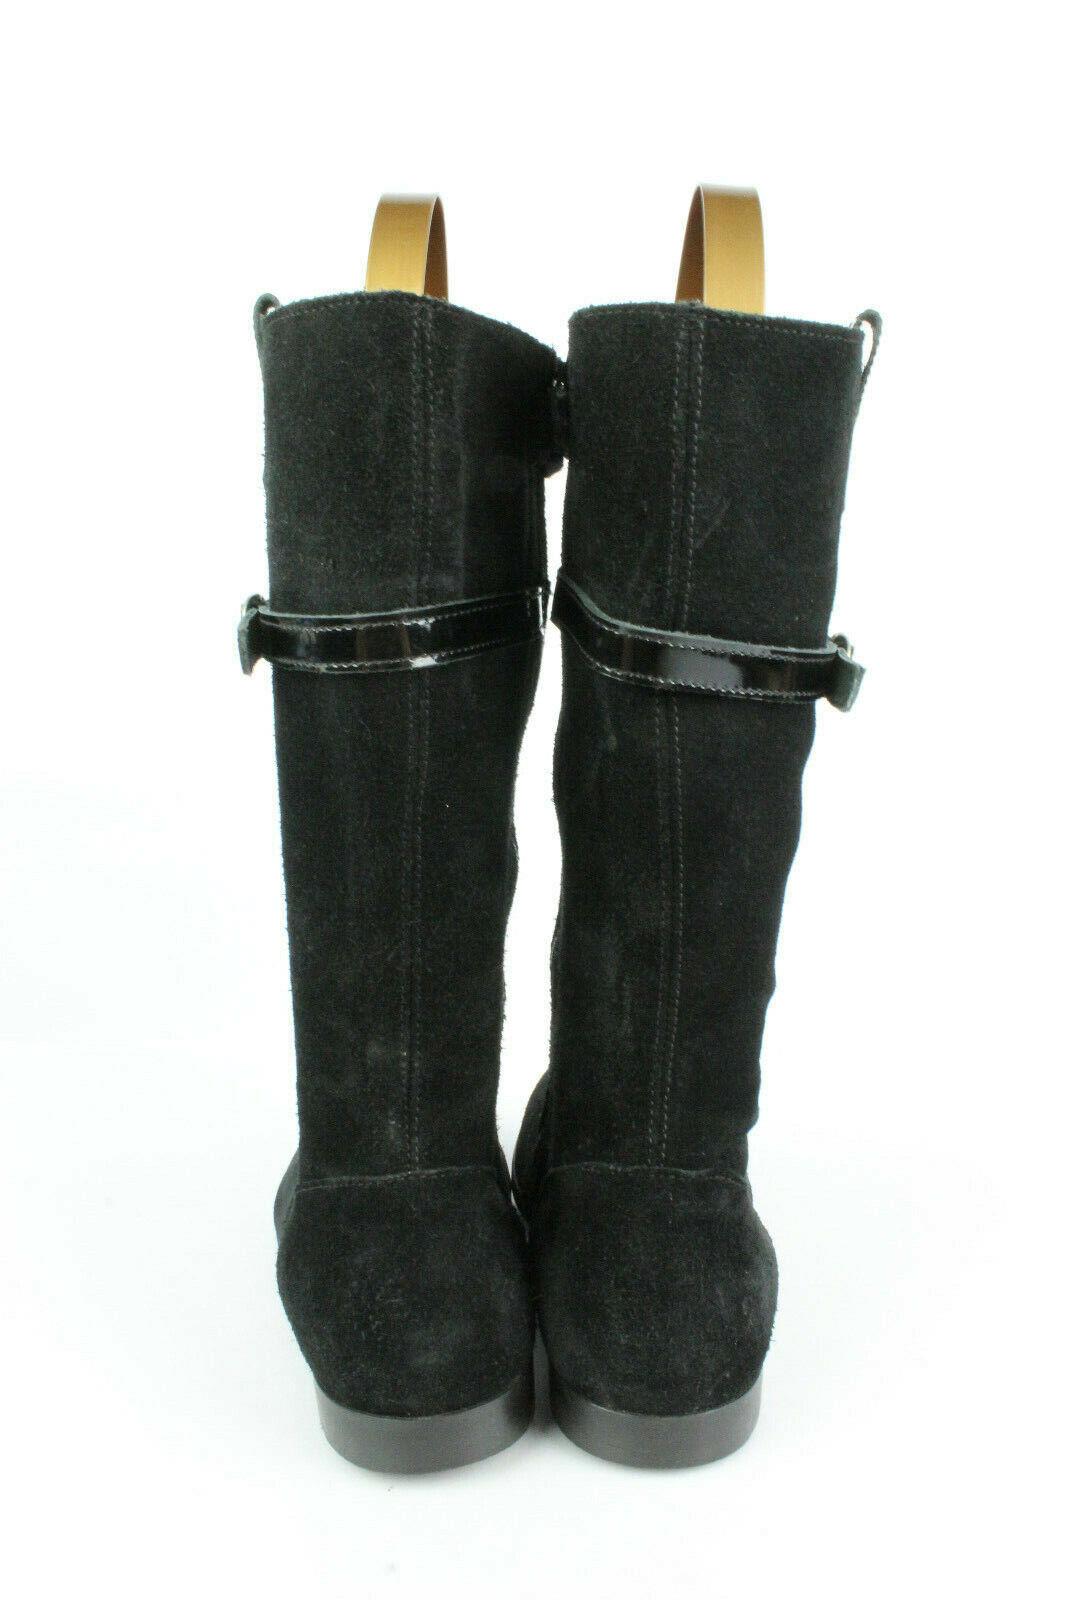 Boots MARALEX MARALEX MARALEX PARIS Black Suede T 37   UK 4 VERY GOOD CONDITION 44462d